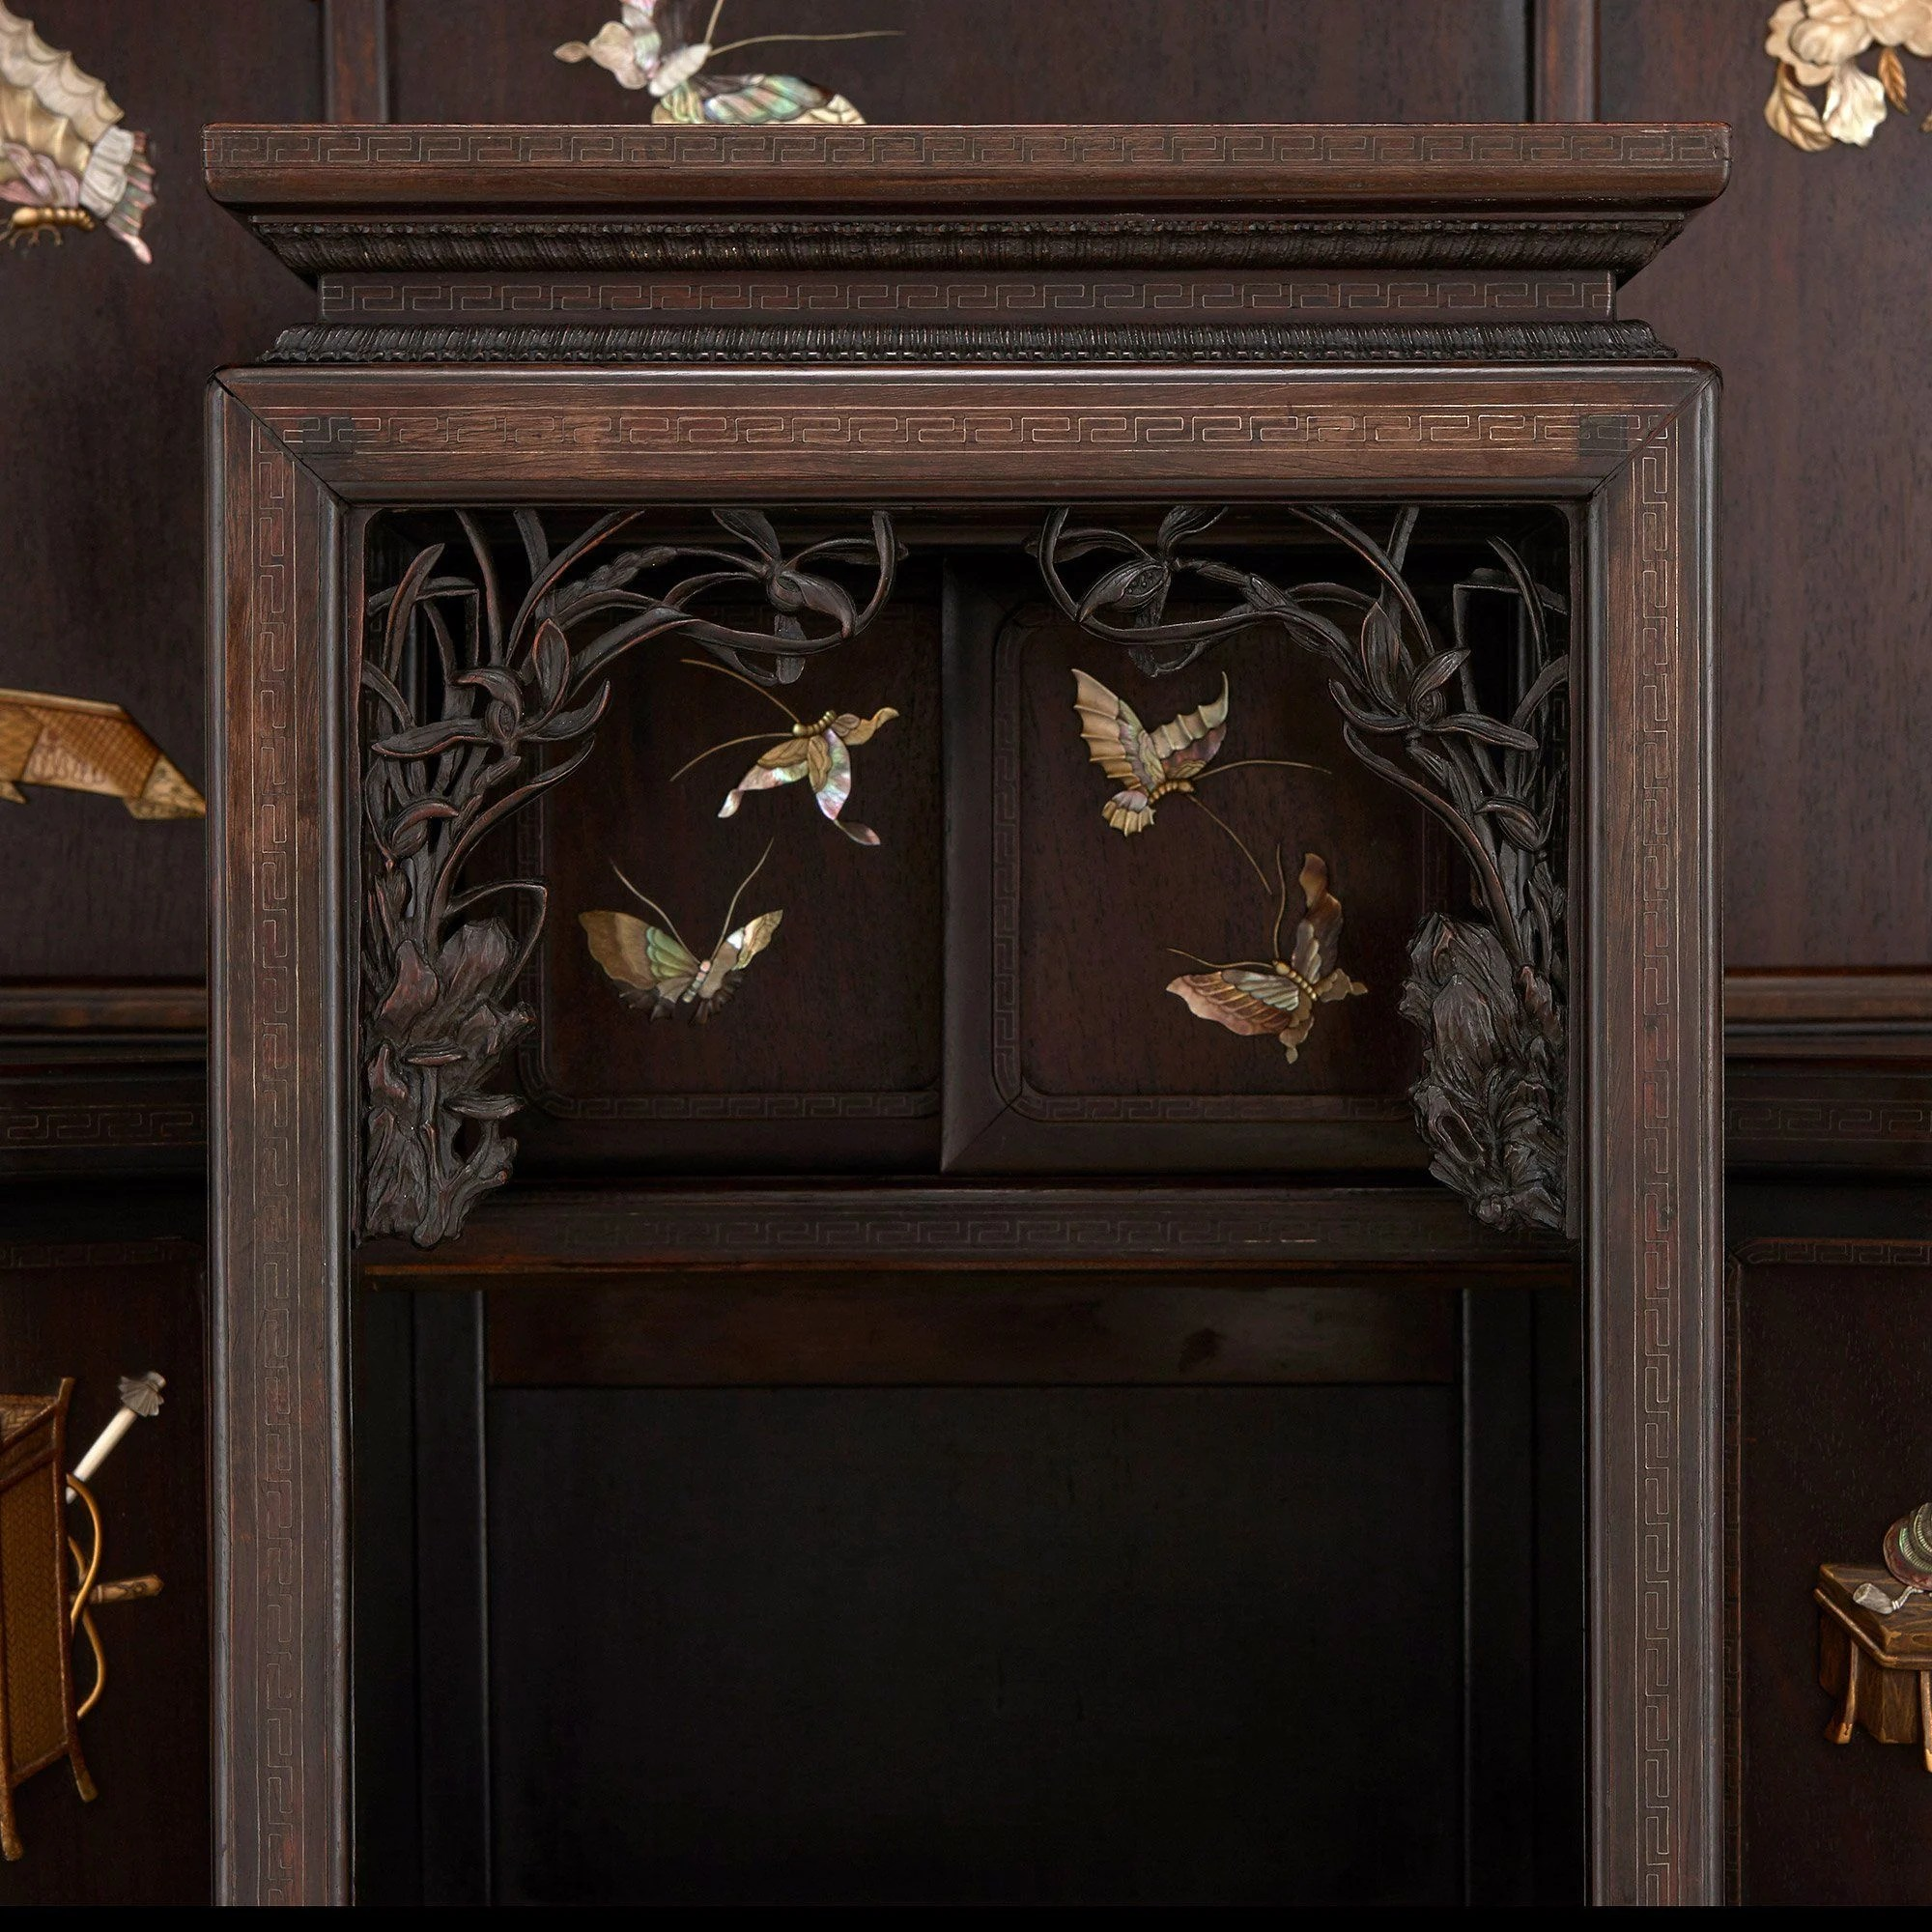 Japanese ivory and motherofpearl inlaid hardwood cabinet